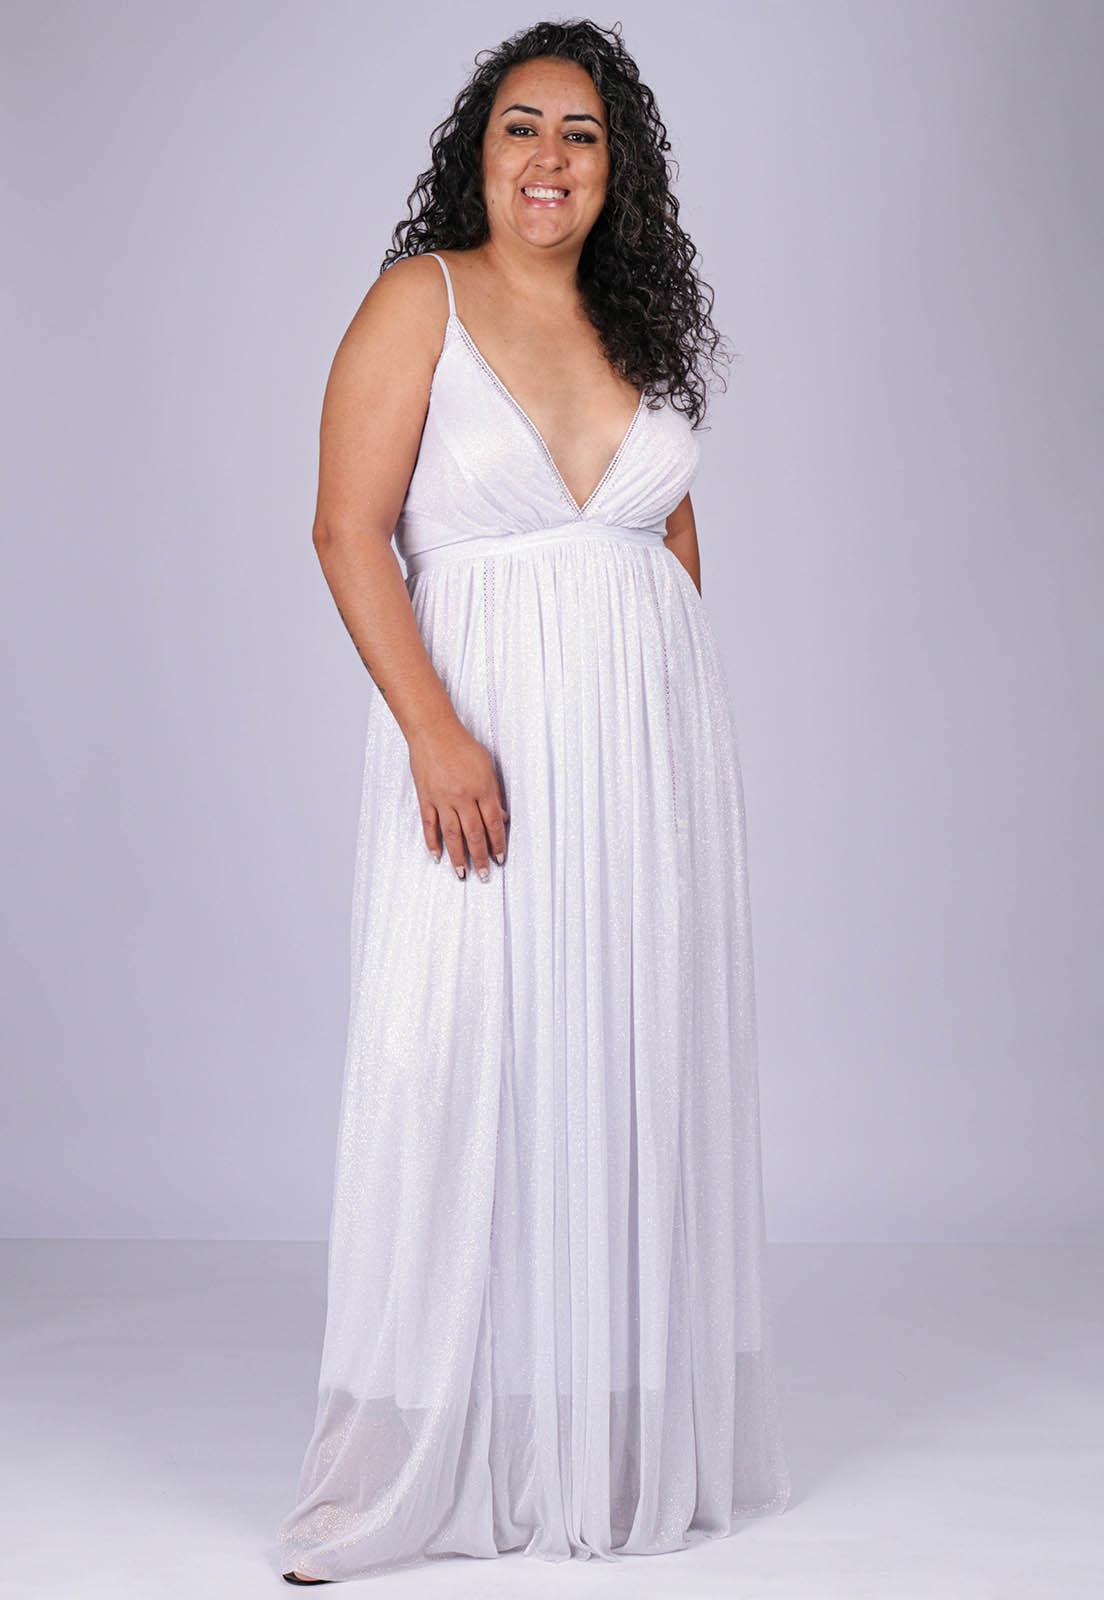 Vestido Longo de Festa com detalhe de Renda Branco